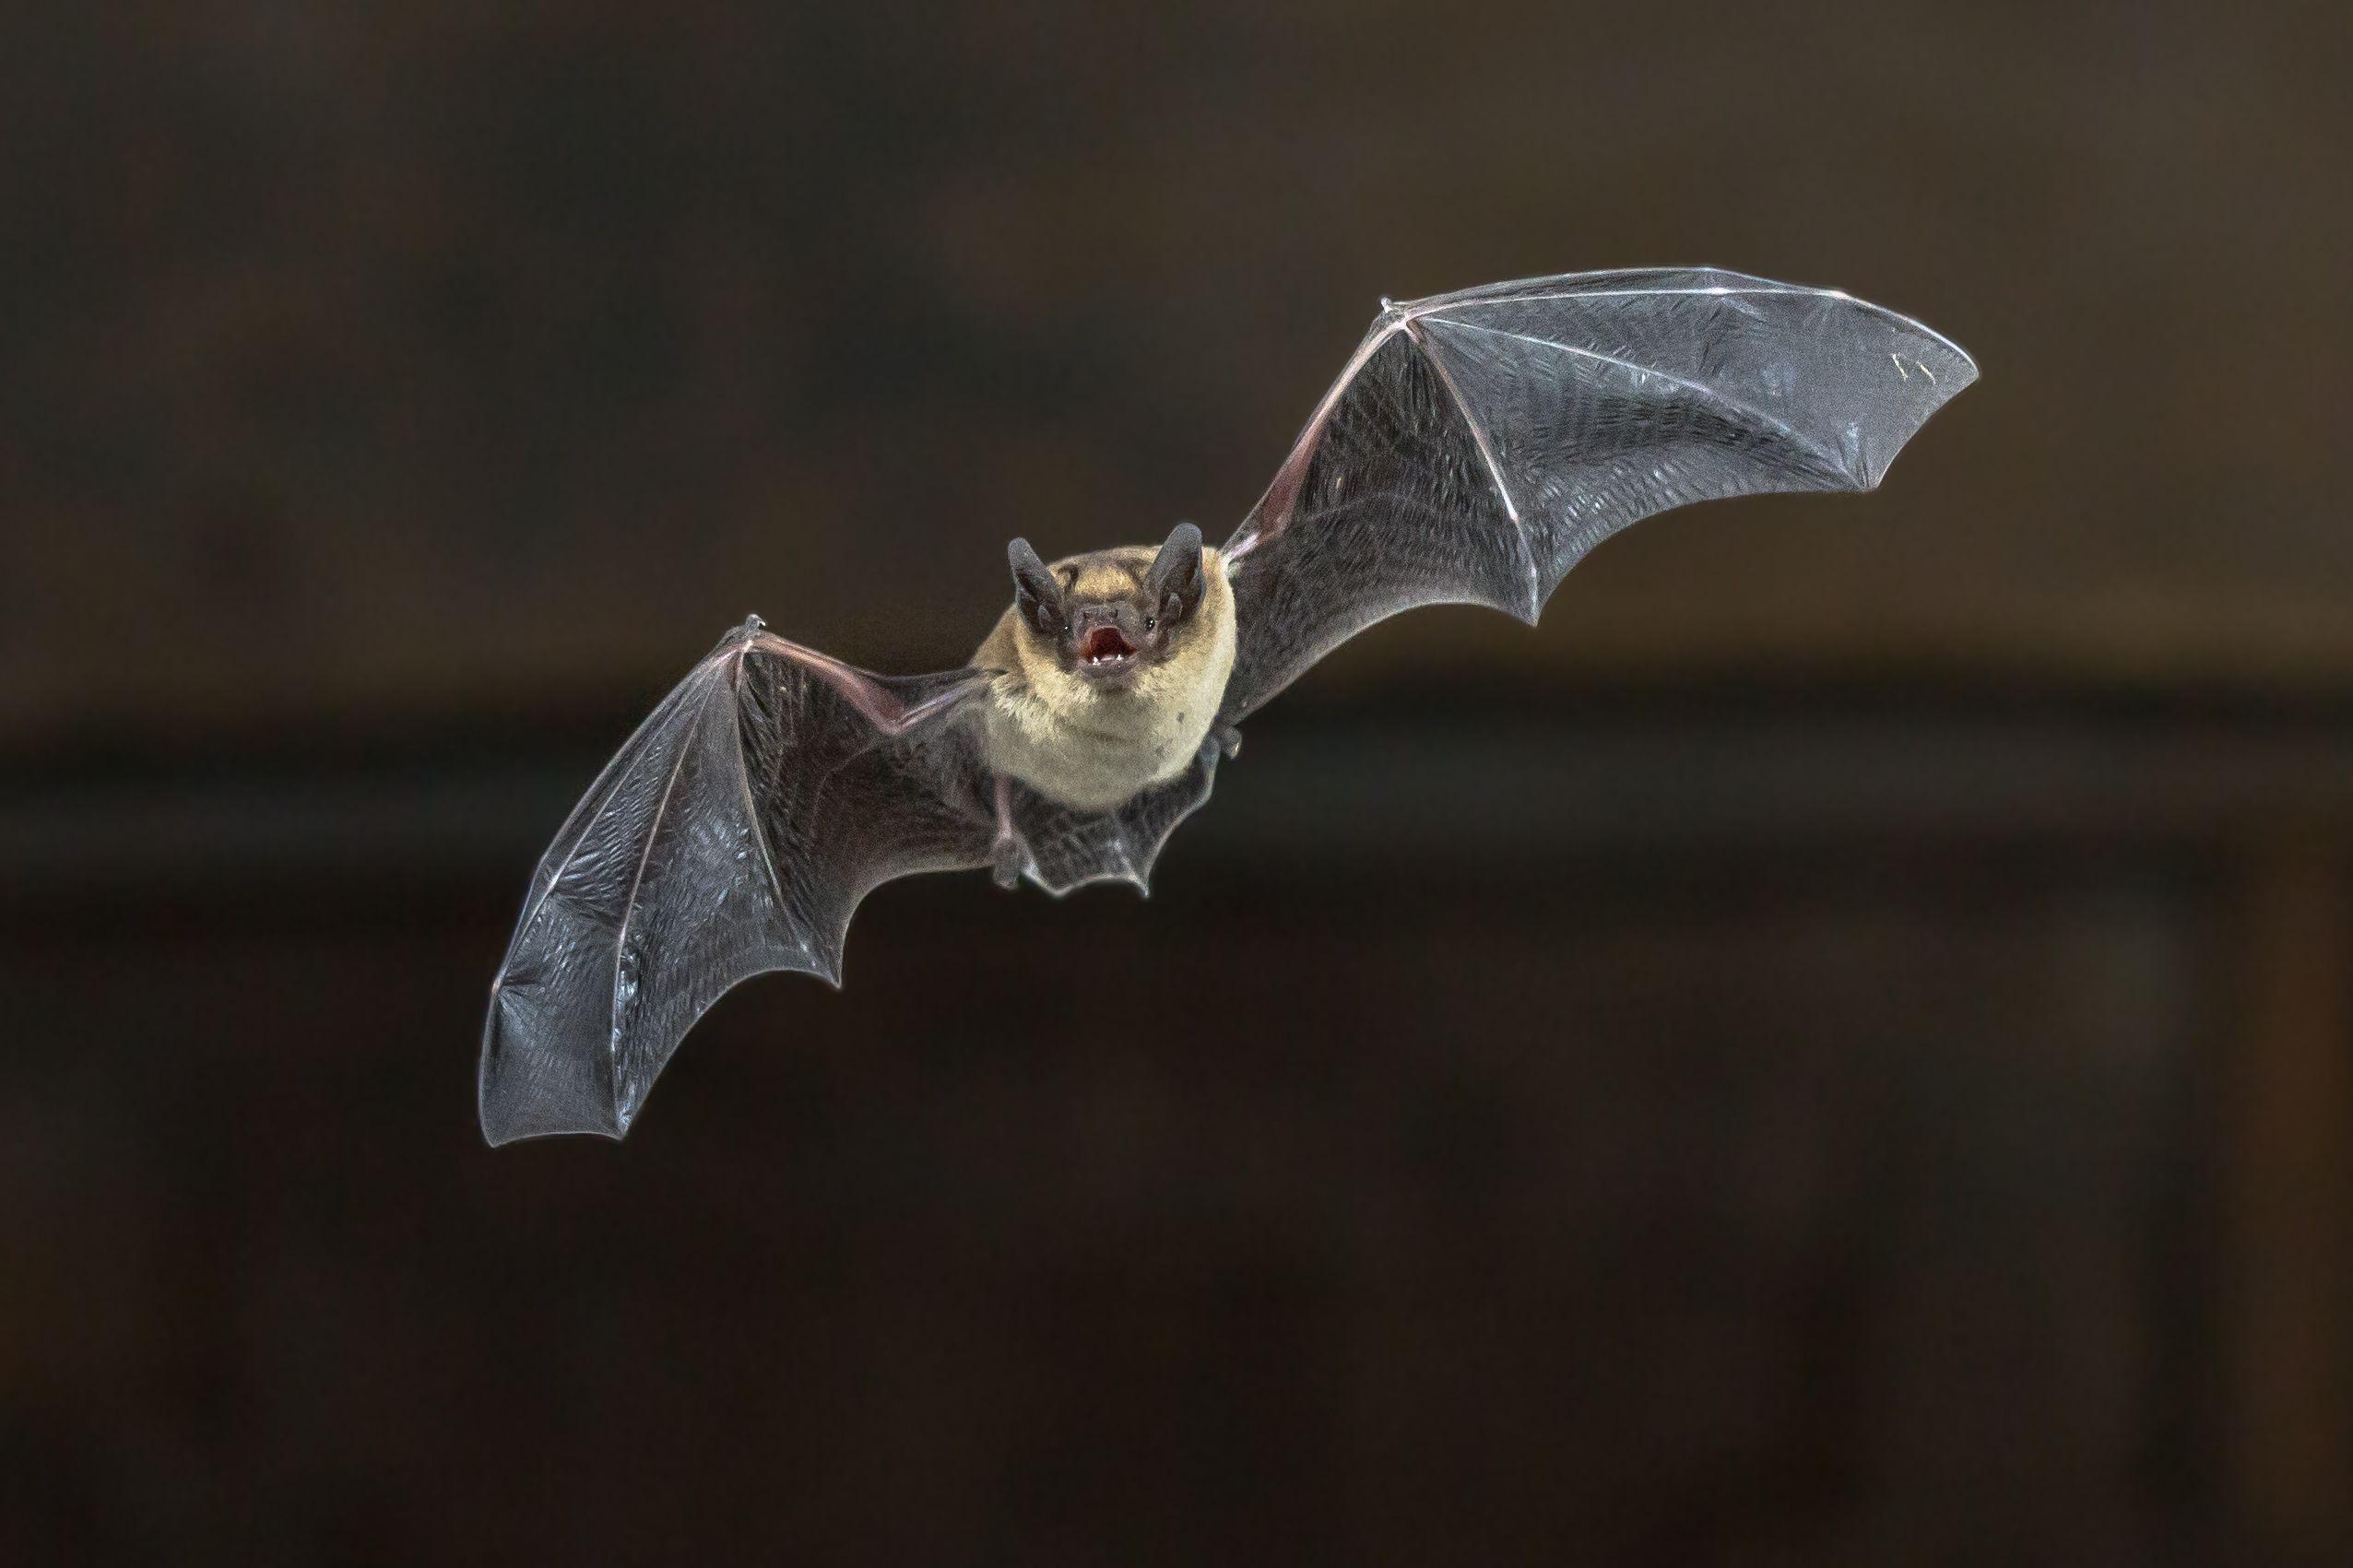 Bat Facts And Photos Animal Fun Facts Bat Appreciation Day